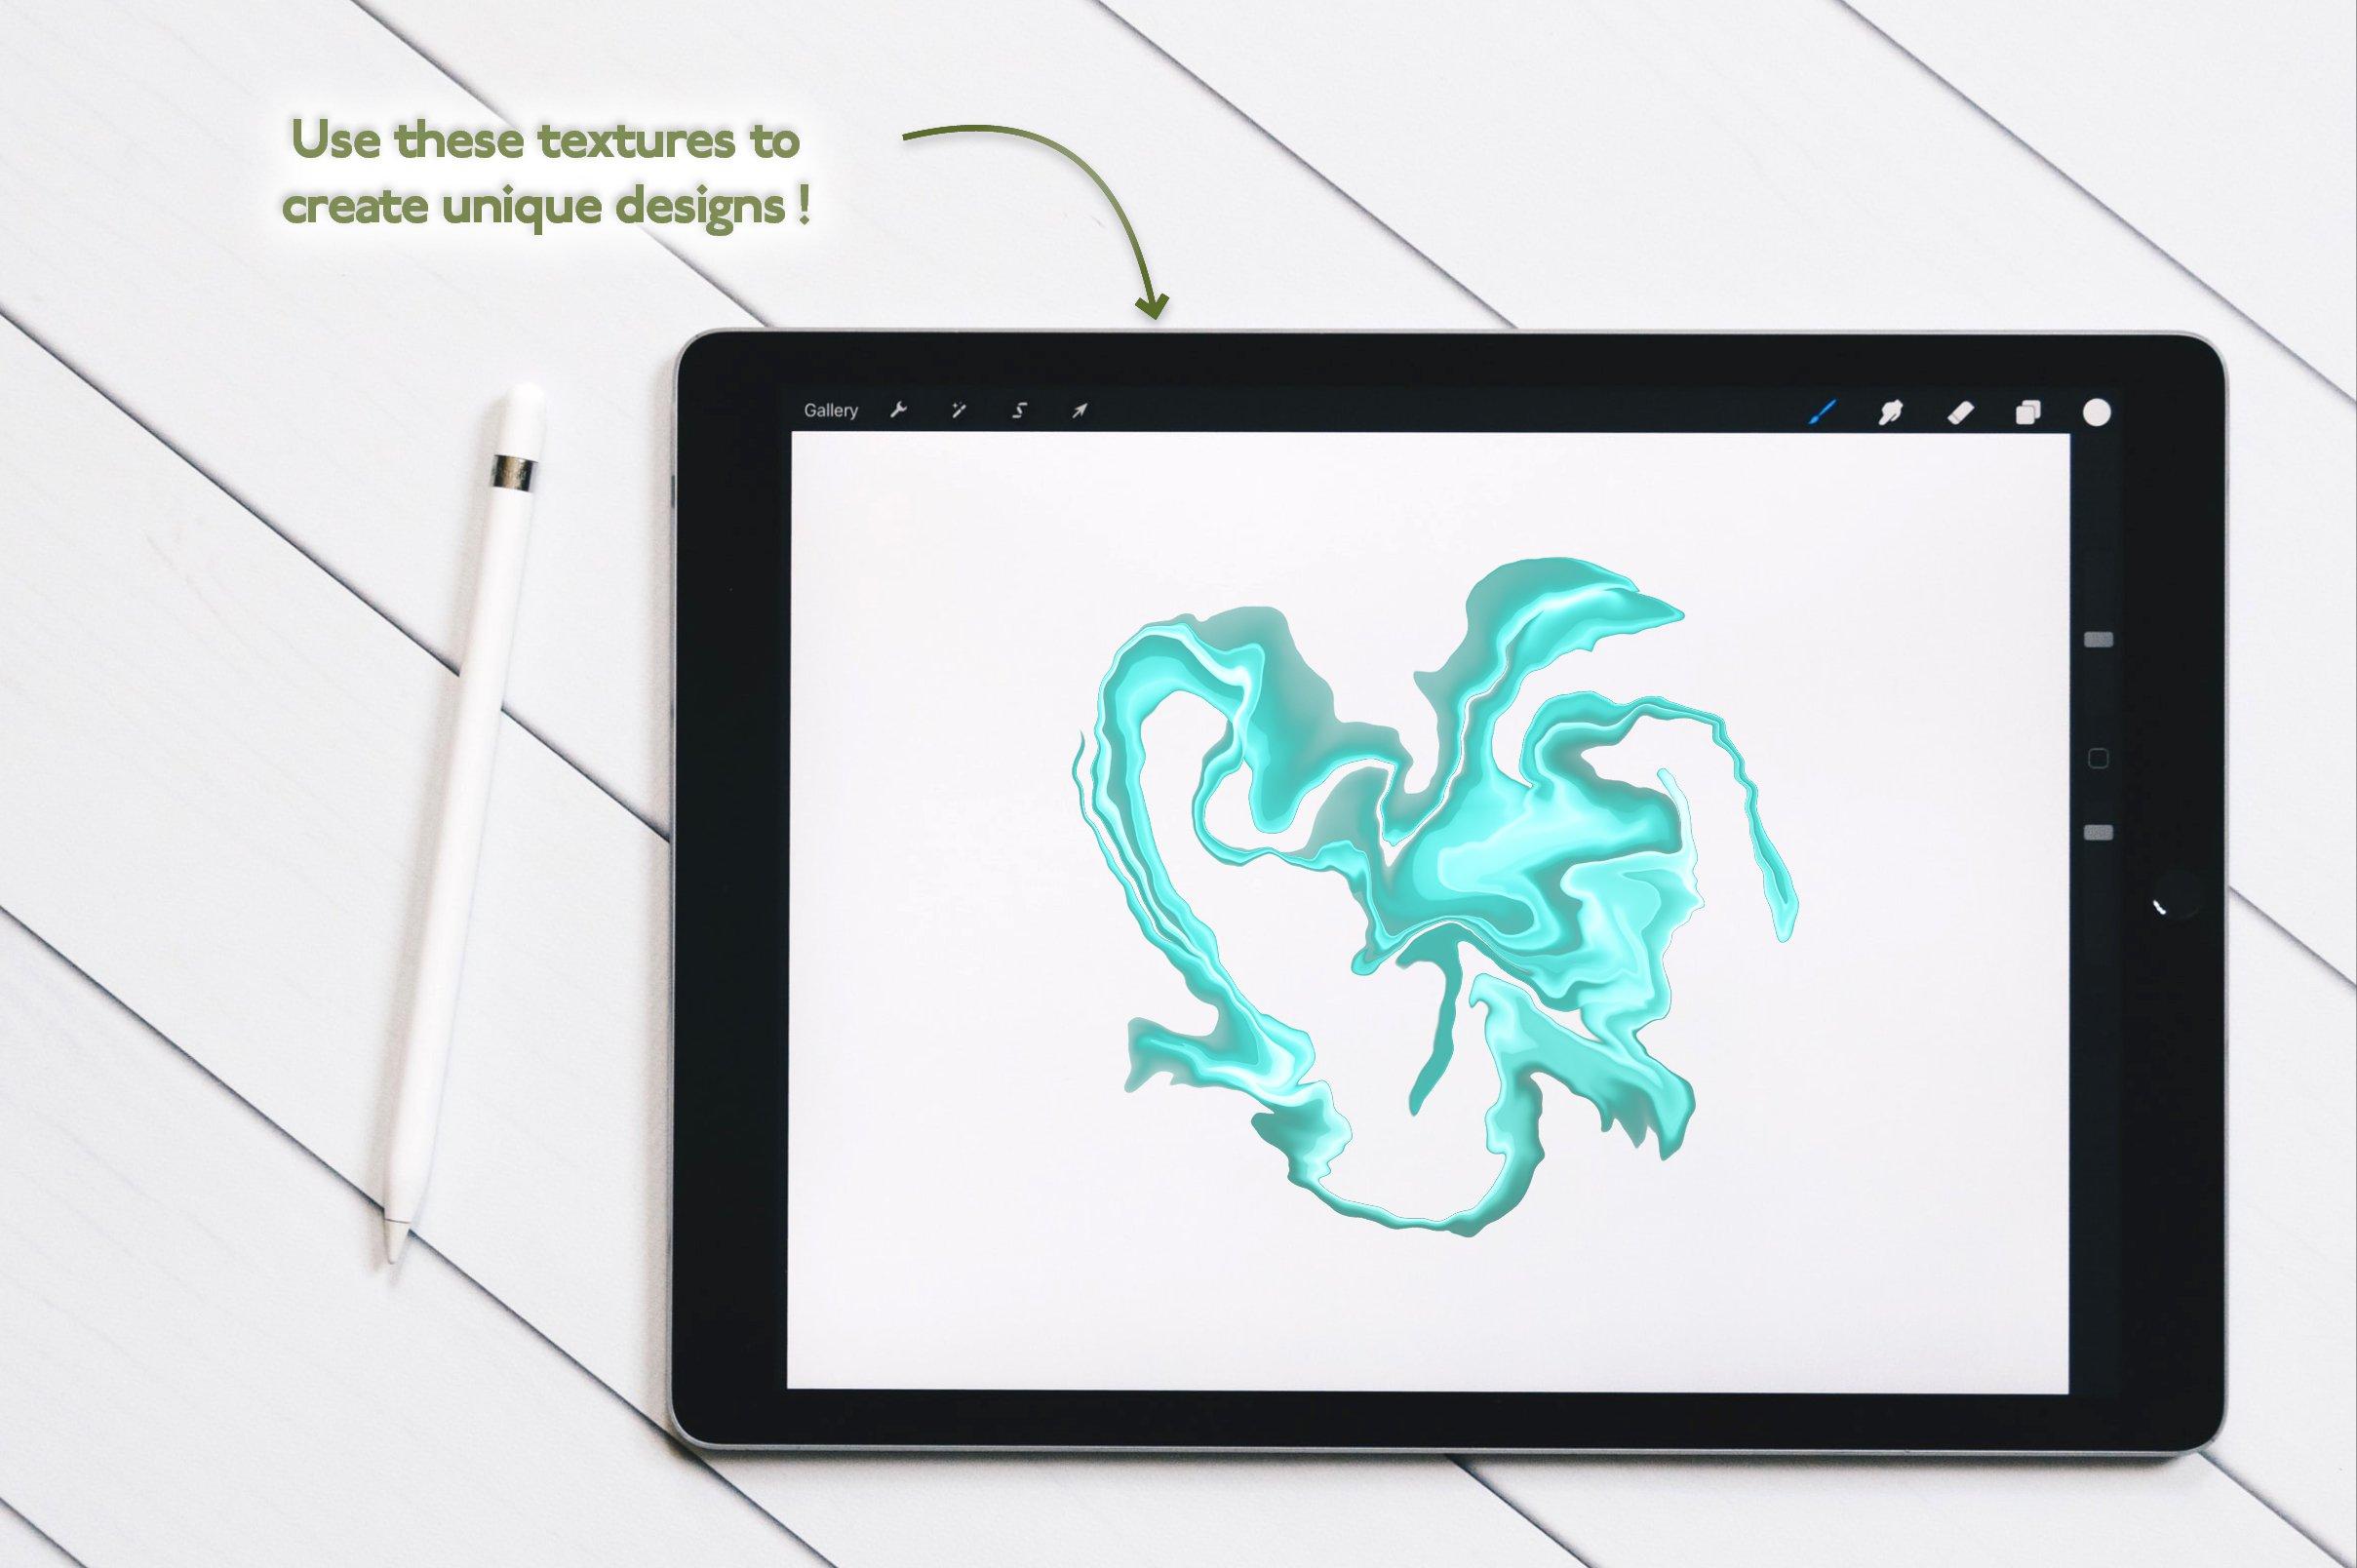 大理石纹理Procreate笔刷 Liquid Marble Texture Brush Bundle Noise插图(5)